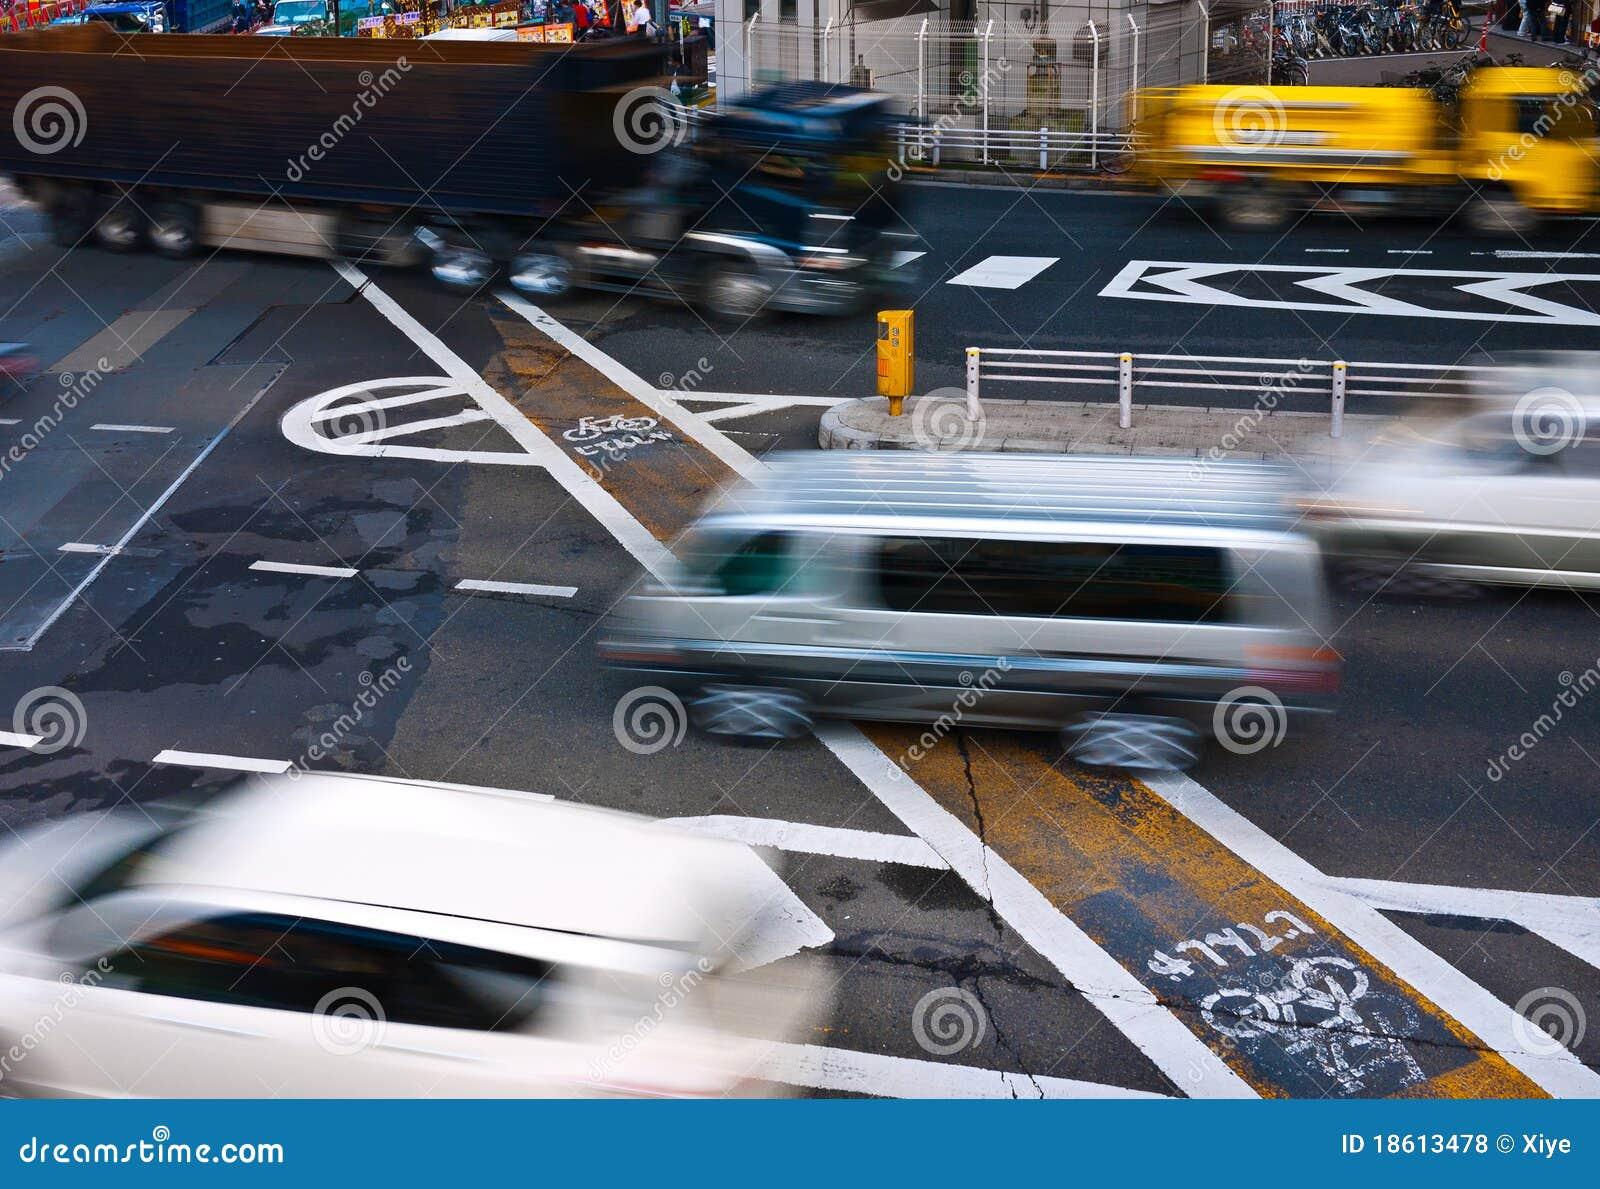 Vehicles running in city